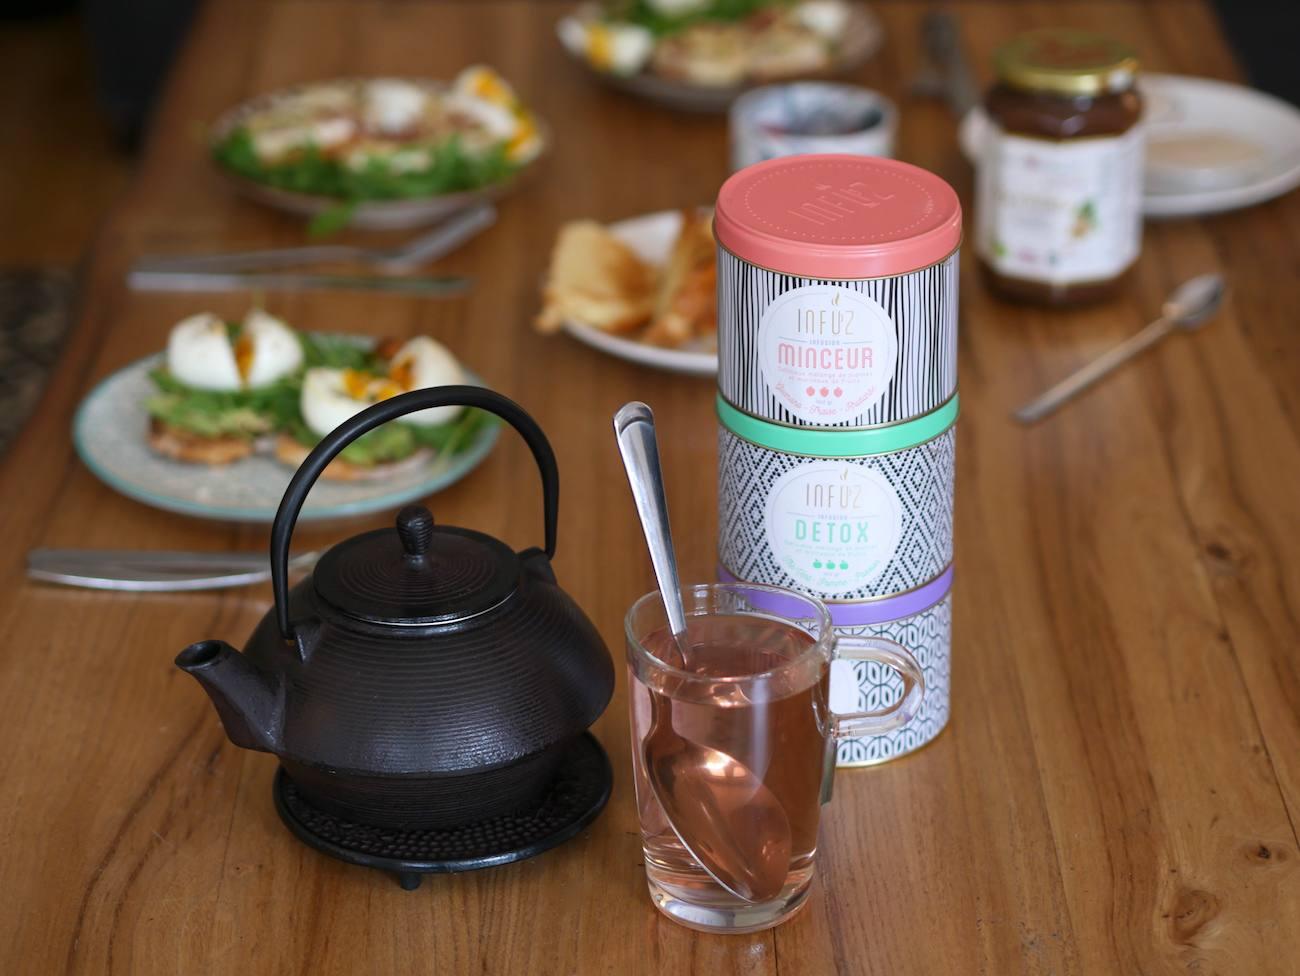 brunch-maison-recette-pancakes-toast-oeuf-benedicte-infuz-1